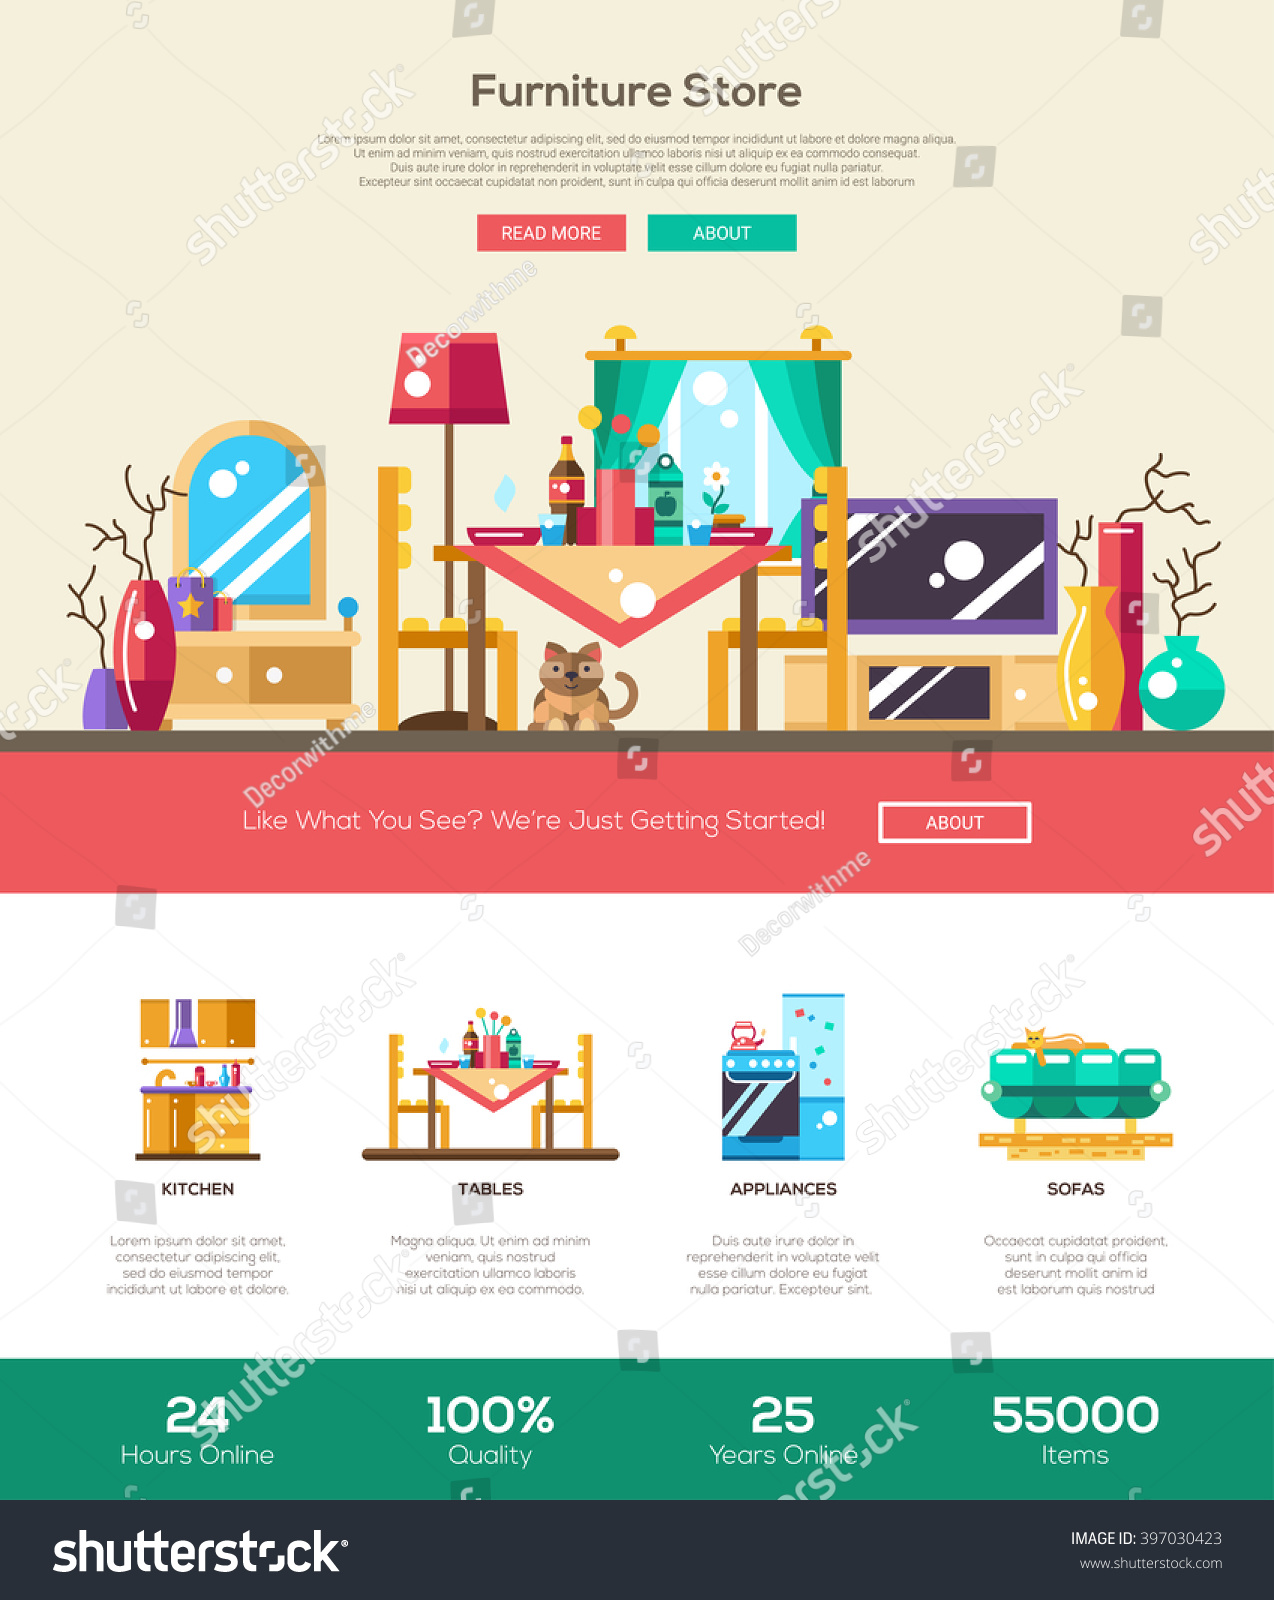 house interior domestic furniture online store stock vector 397030423 shutterstock. Black Bedroom Furniture Sets. Home Design Ideas